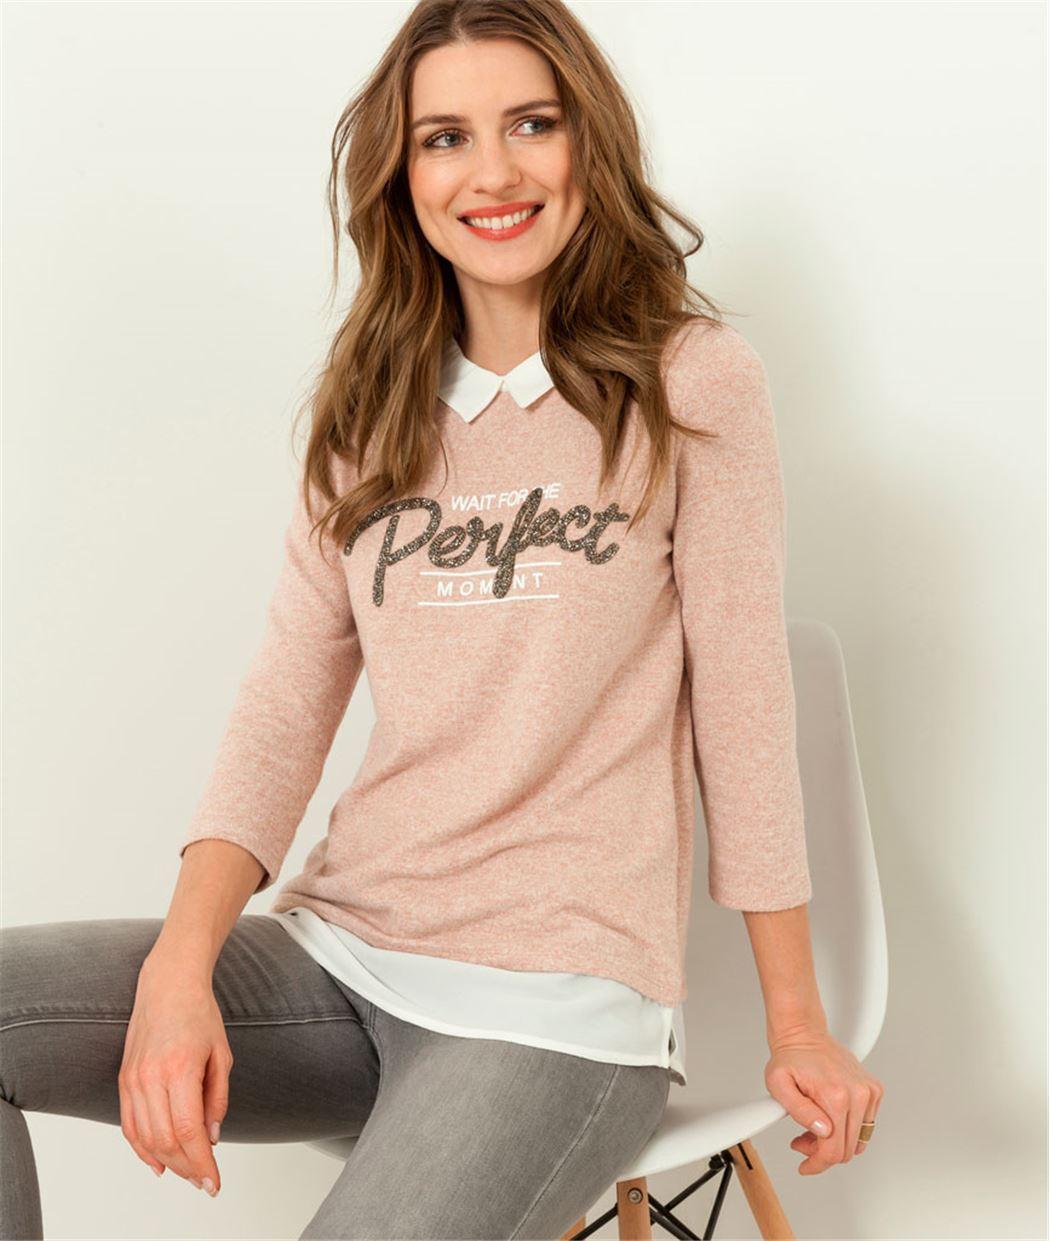 T-shirt femme 2 en 1 et message perles ROSE